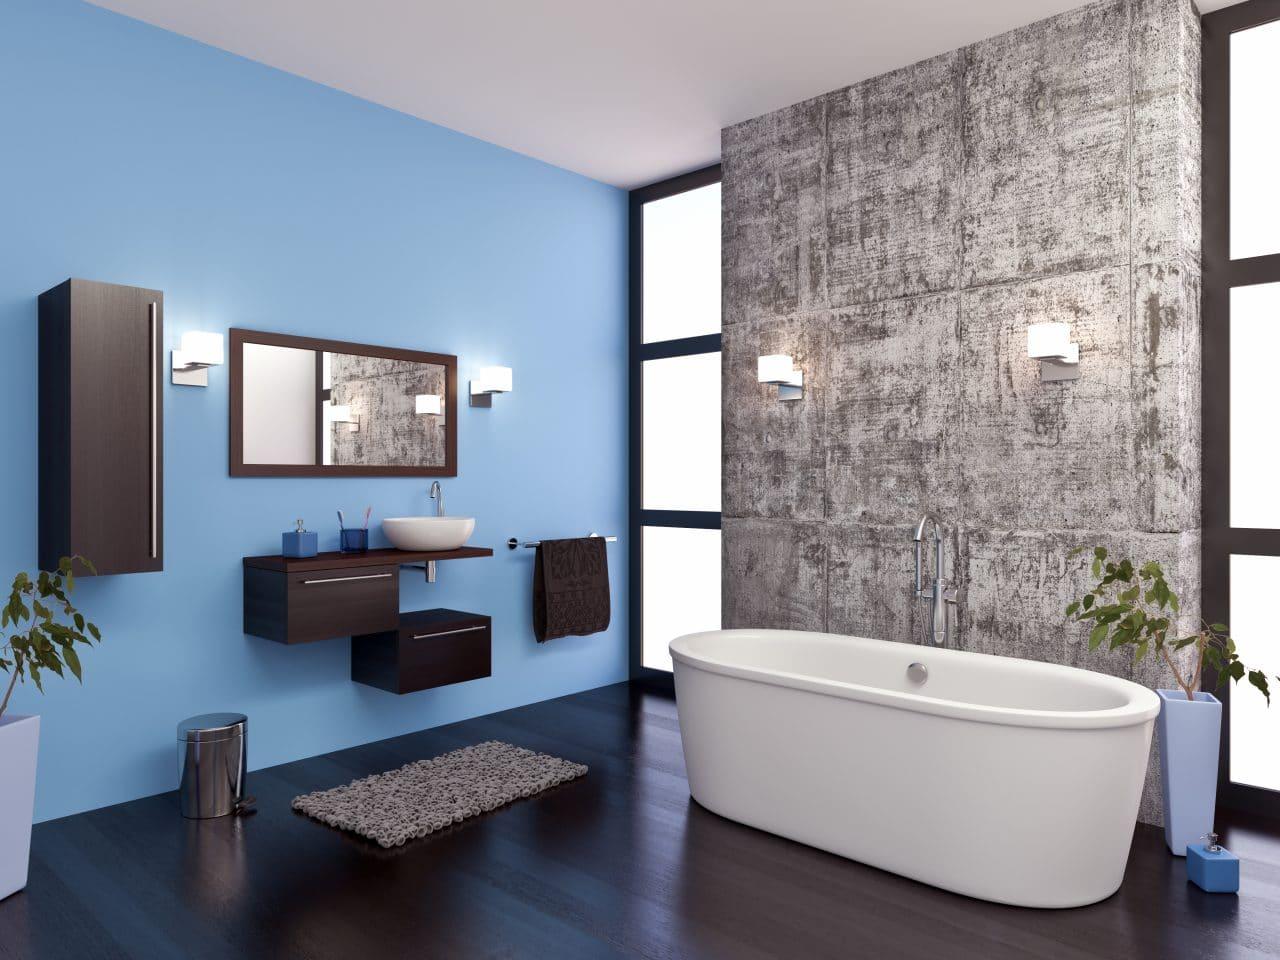 Salle de bain rénovée design